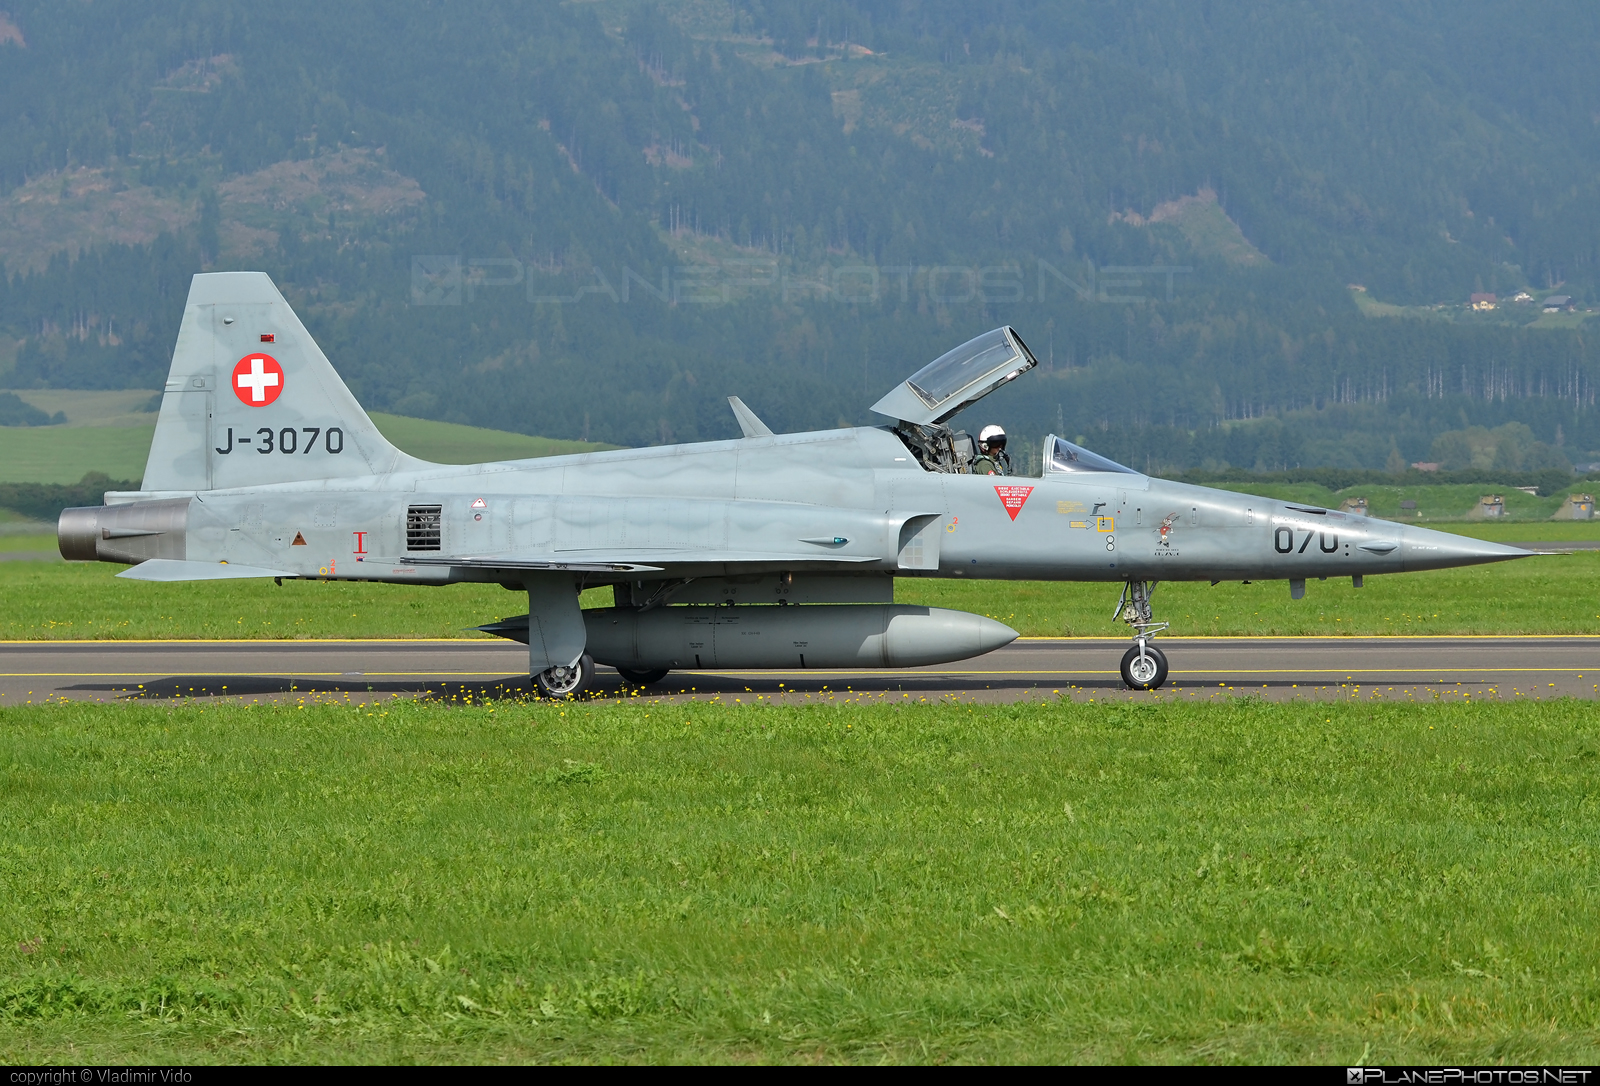 Northrop F-5E Tiger II - J-3070 operated by Schweizer Luftwaffe (Swiss Air Force) #f5etiger #northrop #northropf5 #northropf5etiger #northropf5etigerii #schweizerluftwaffe #swissairforce